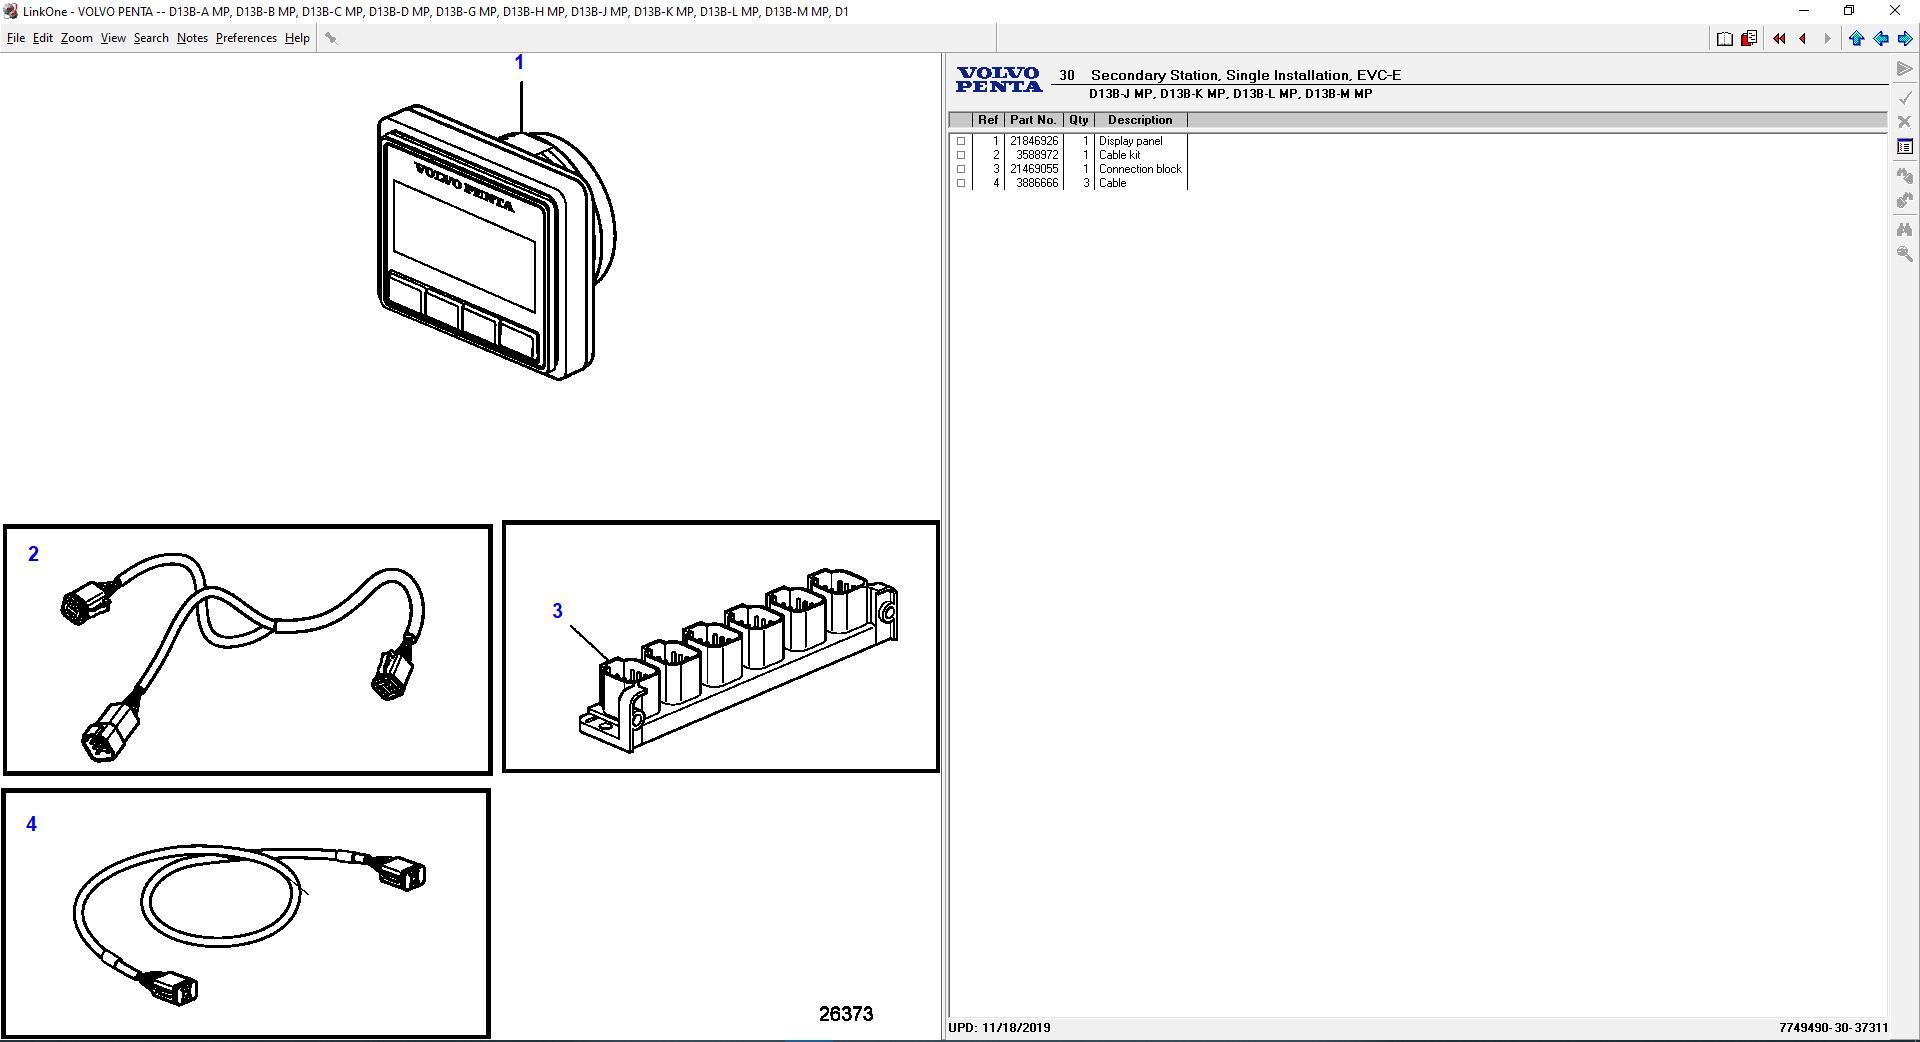 Volvo_Penta_EPC_112019_Marine_and_Industrial_Engine_Spare_Part_Catalog9